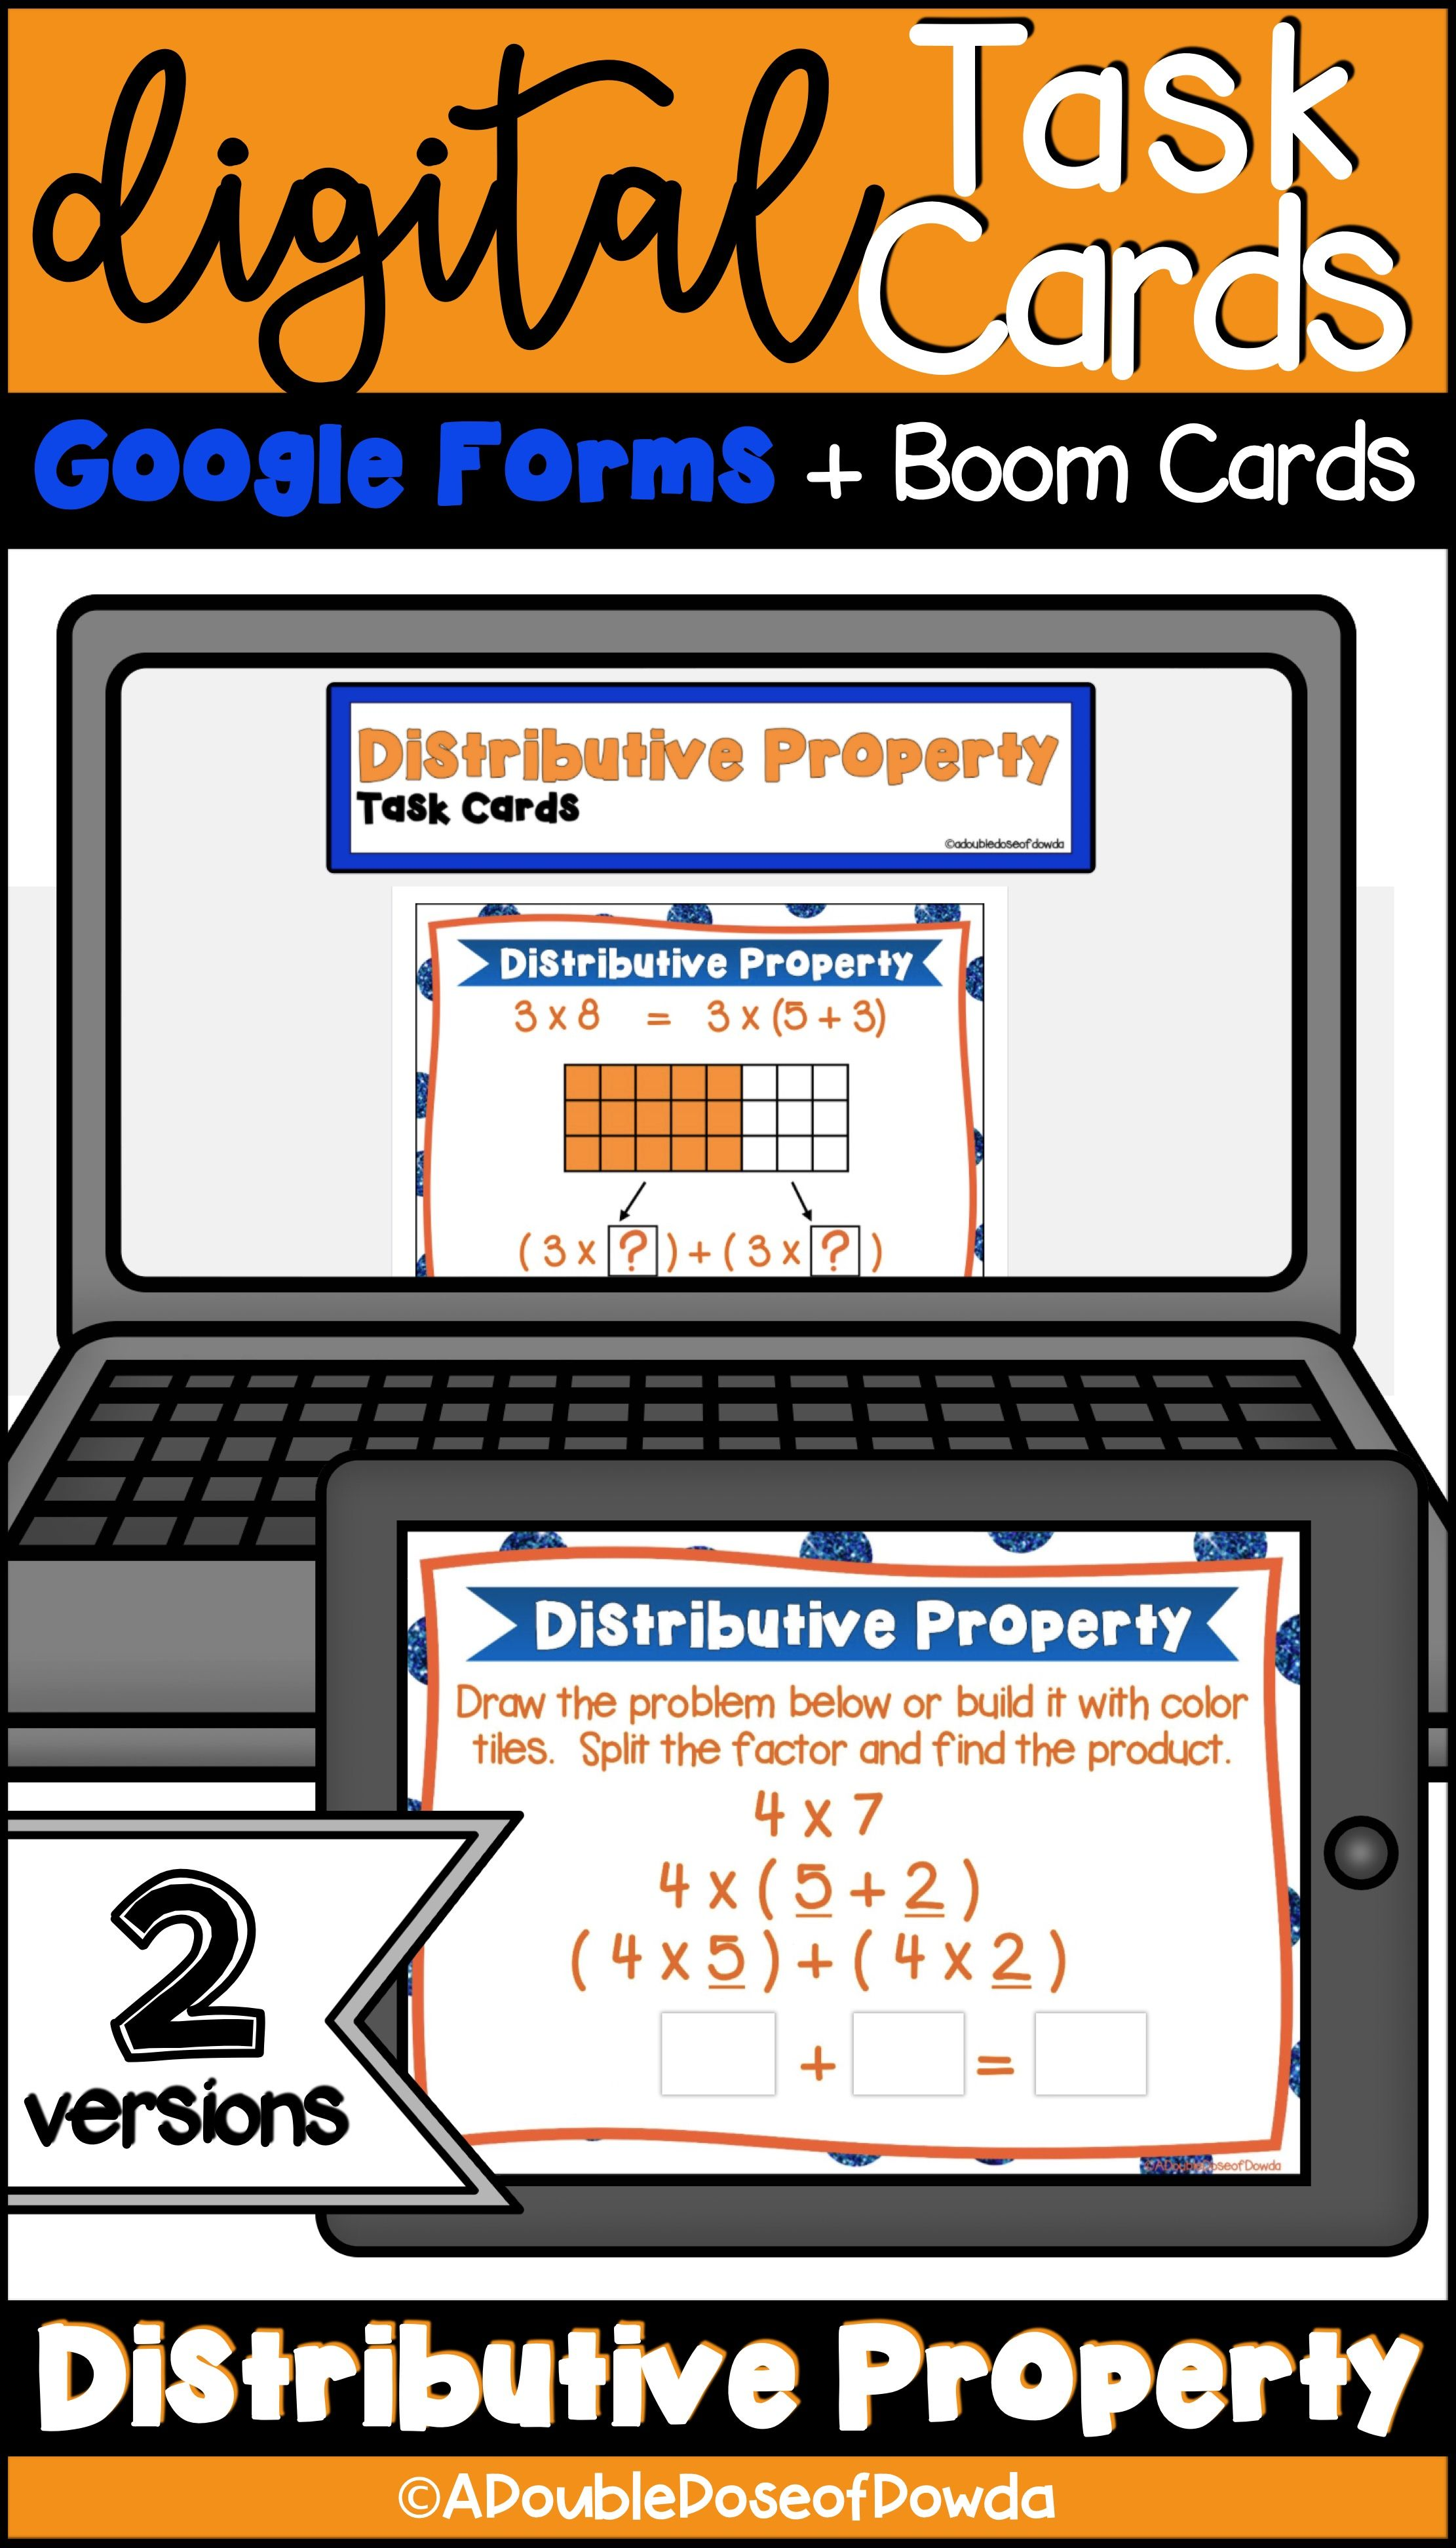 Distributive Property Of Multiplication Digital Task Cards For Distance Learning Task Cards Elementary Math Centers Distributive Property Task Cards